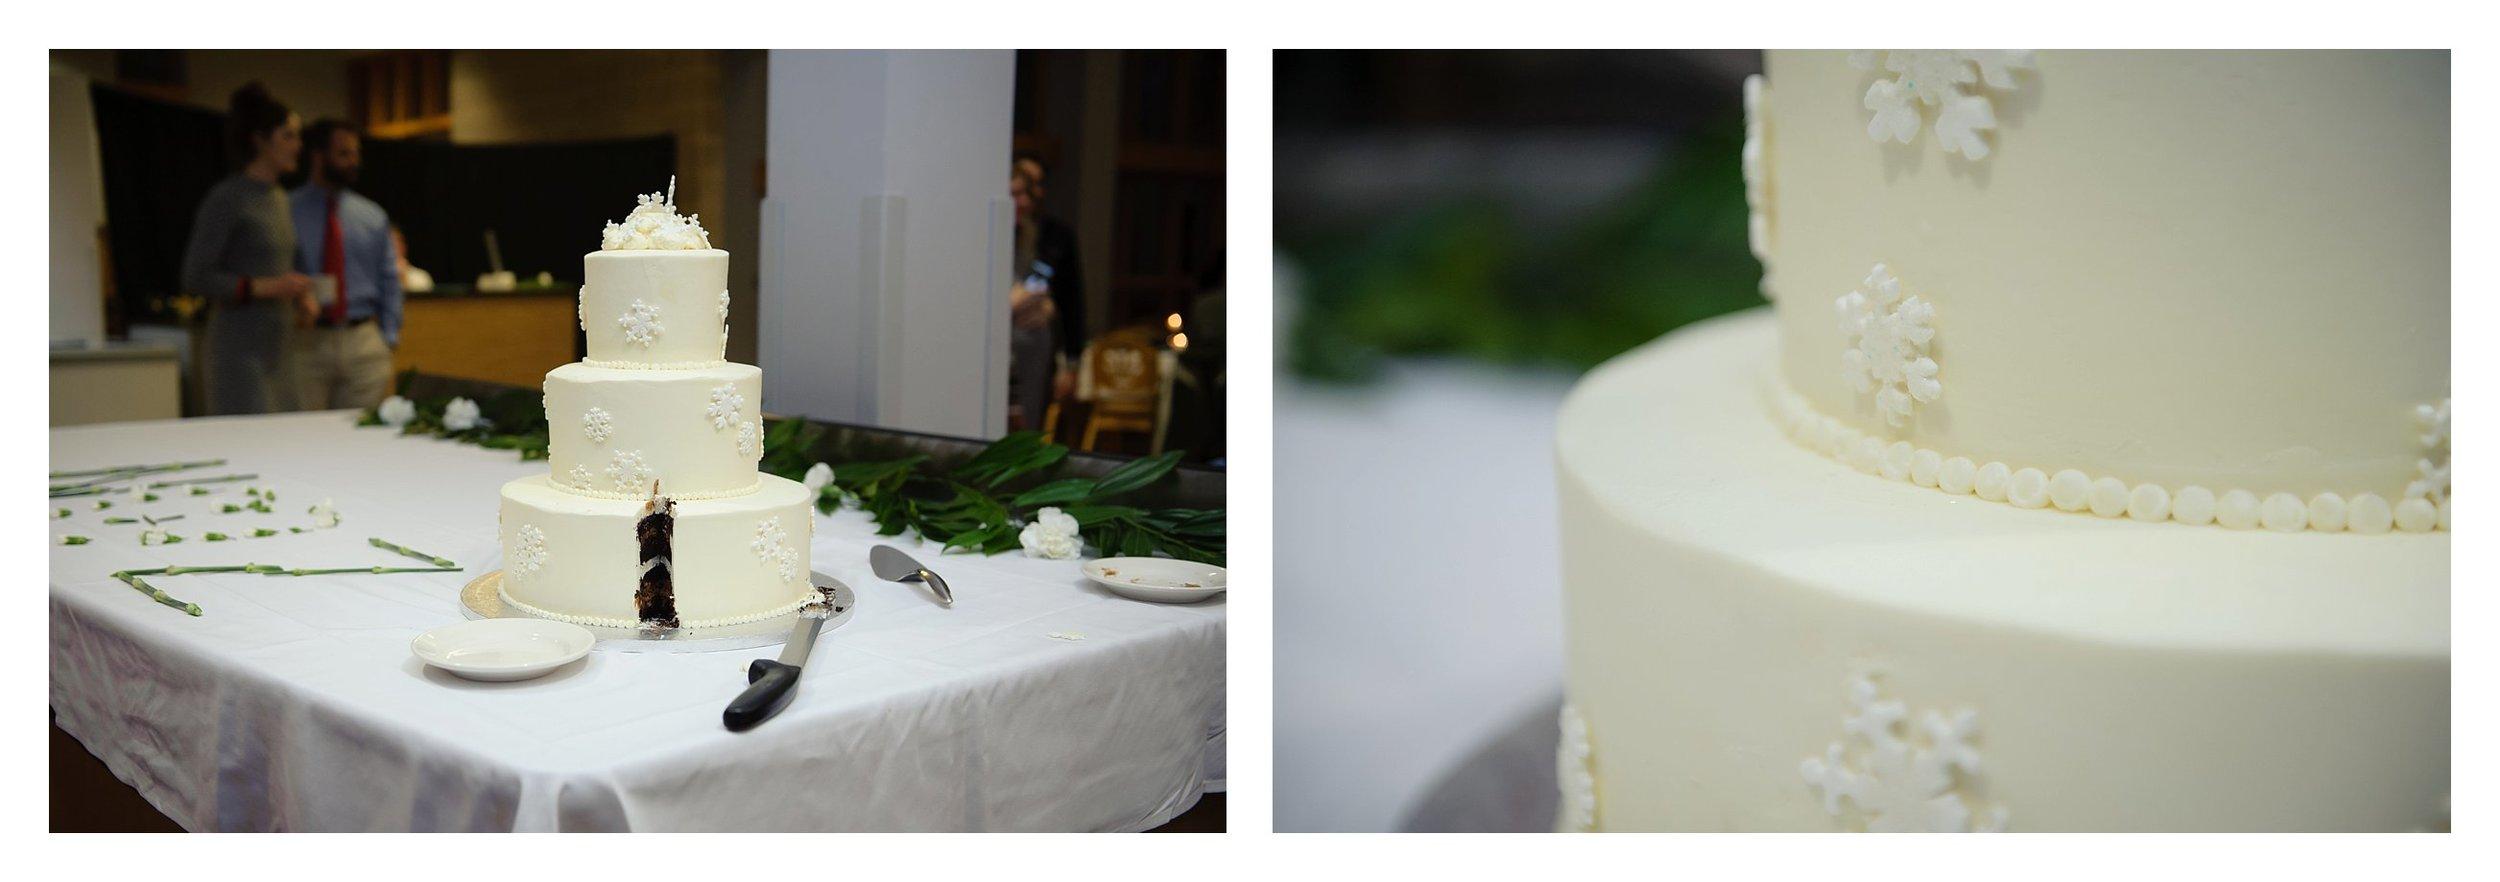 ashland wedding photographer iron river brule wisconsin ps 139 photography jen jensen_0150.jpg